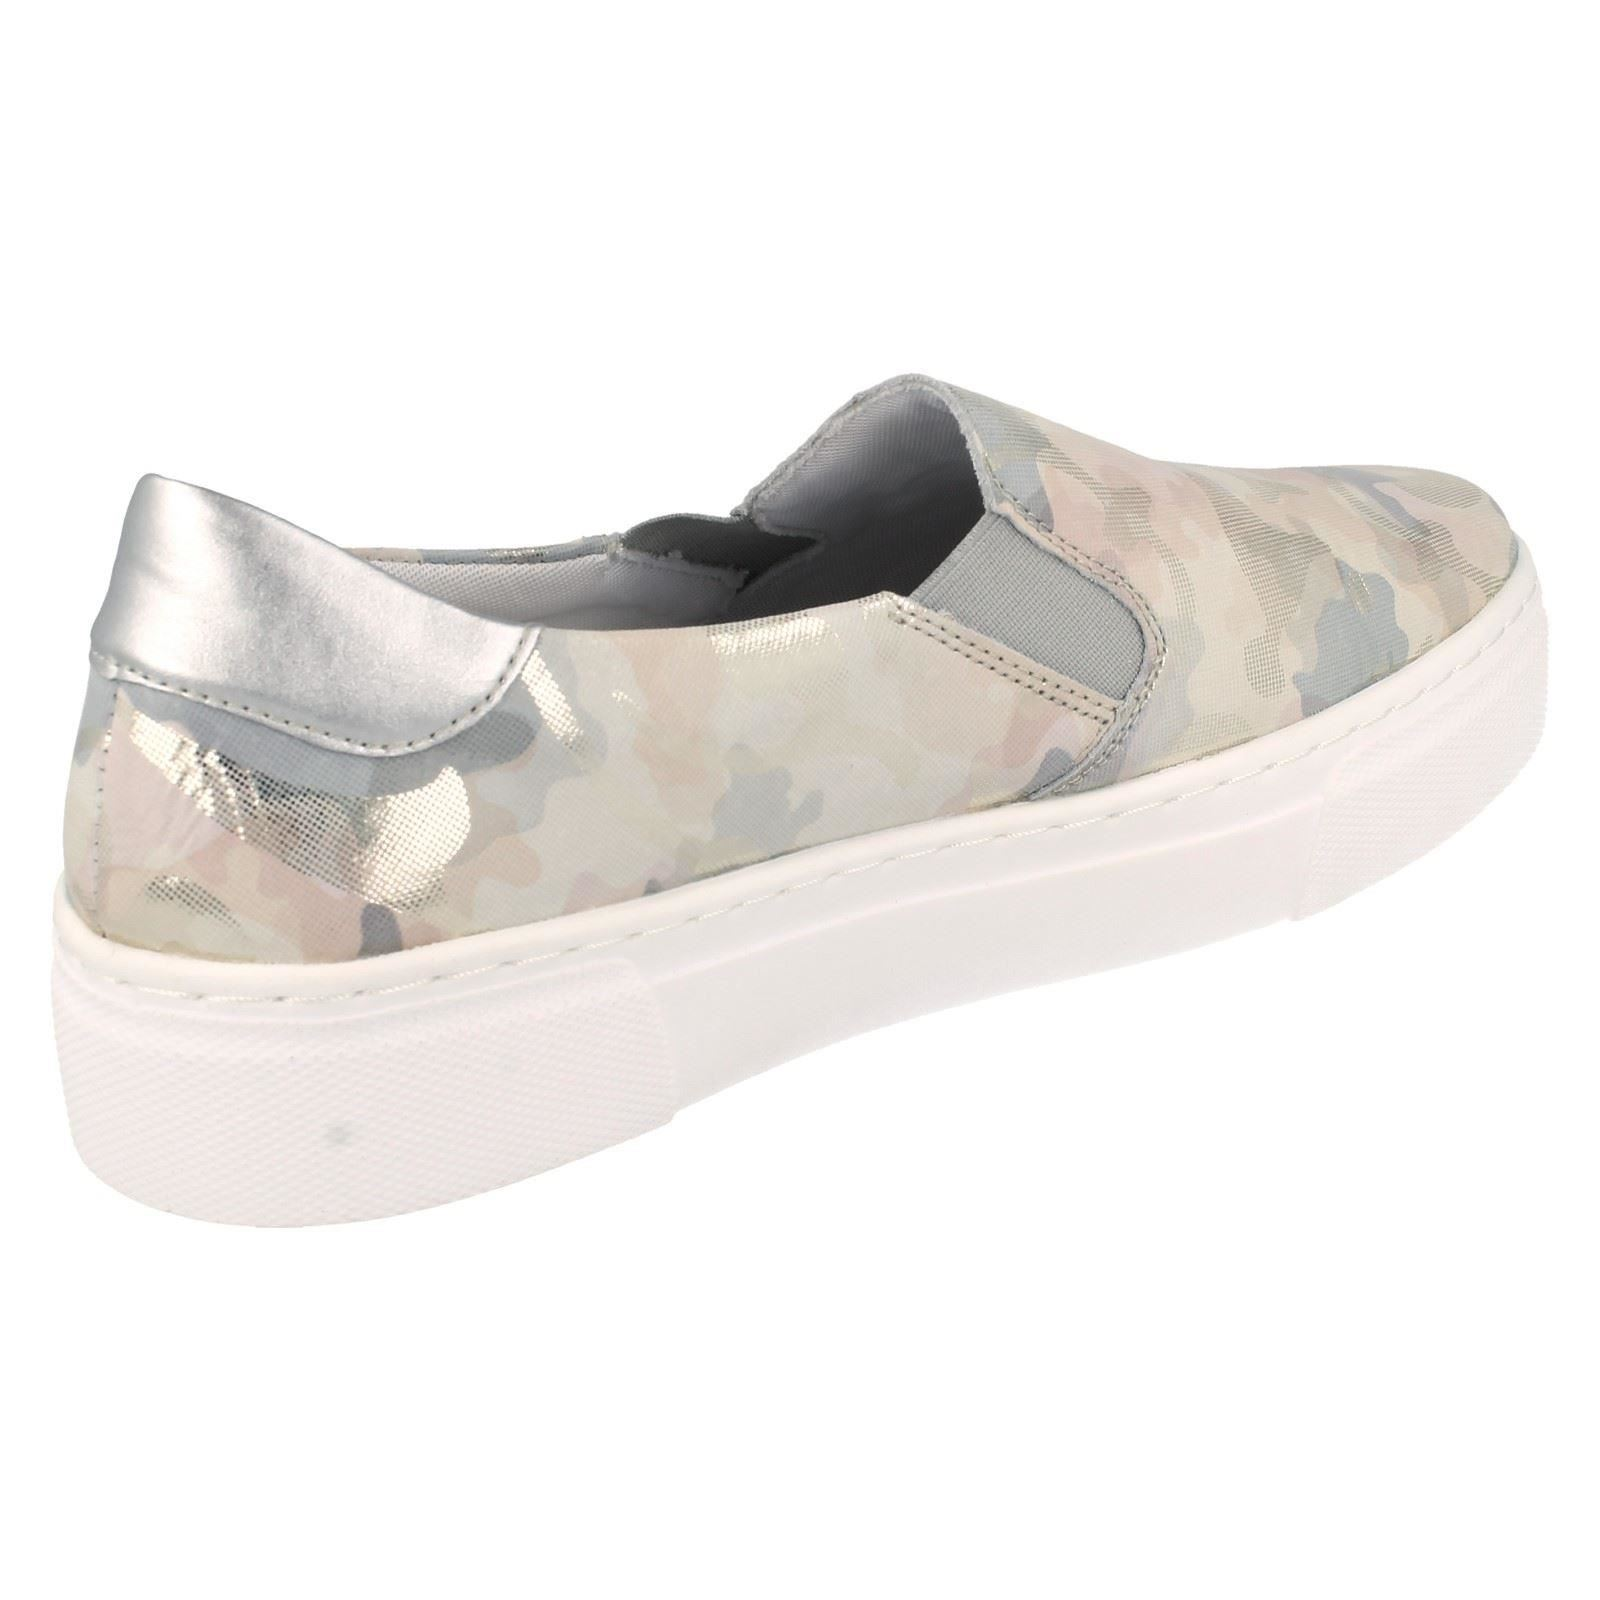 Remonte Multi 'r3100' Ladies 'r3100' Remonte Shoes Remonte Ladies Multi Shoes Shoes Multi Ladies 'r3100' qYnTdISxY